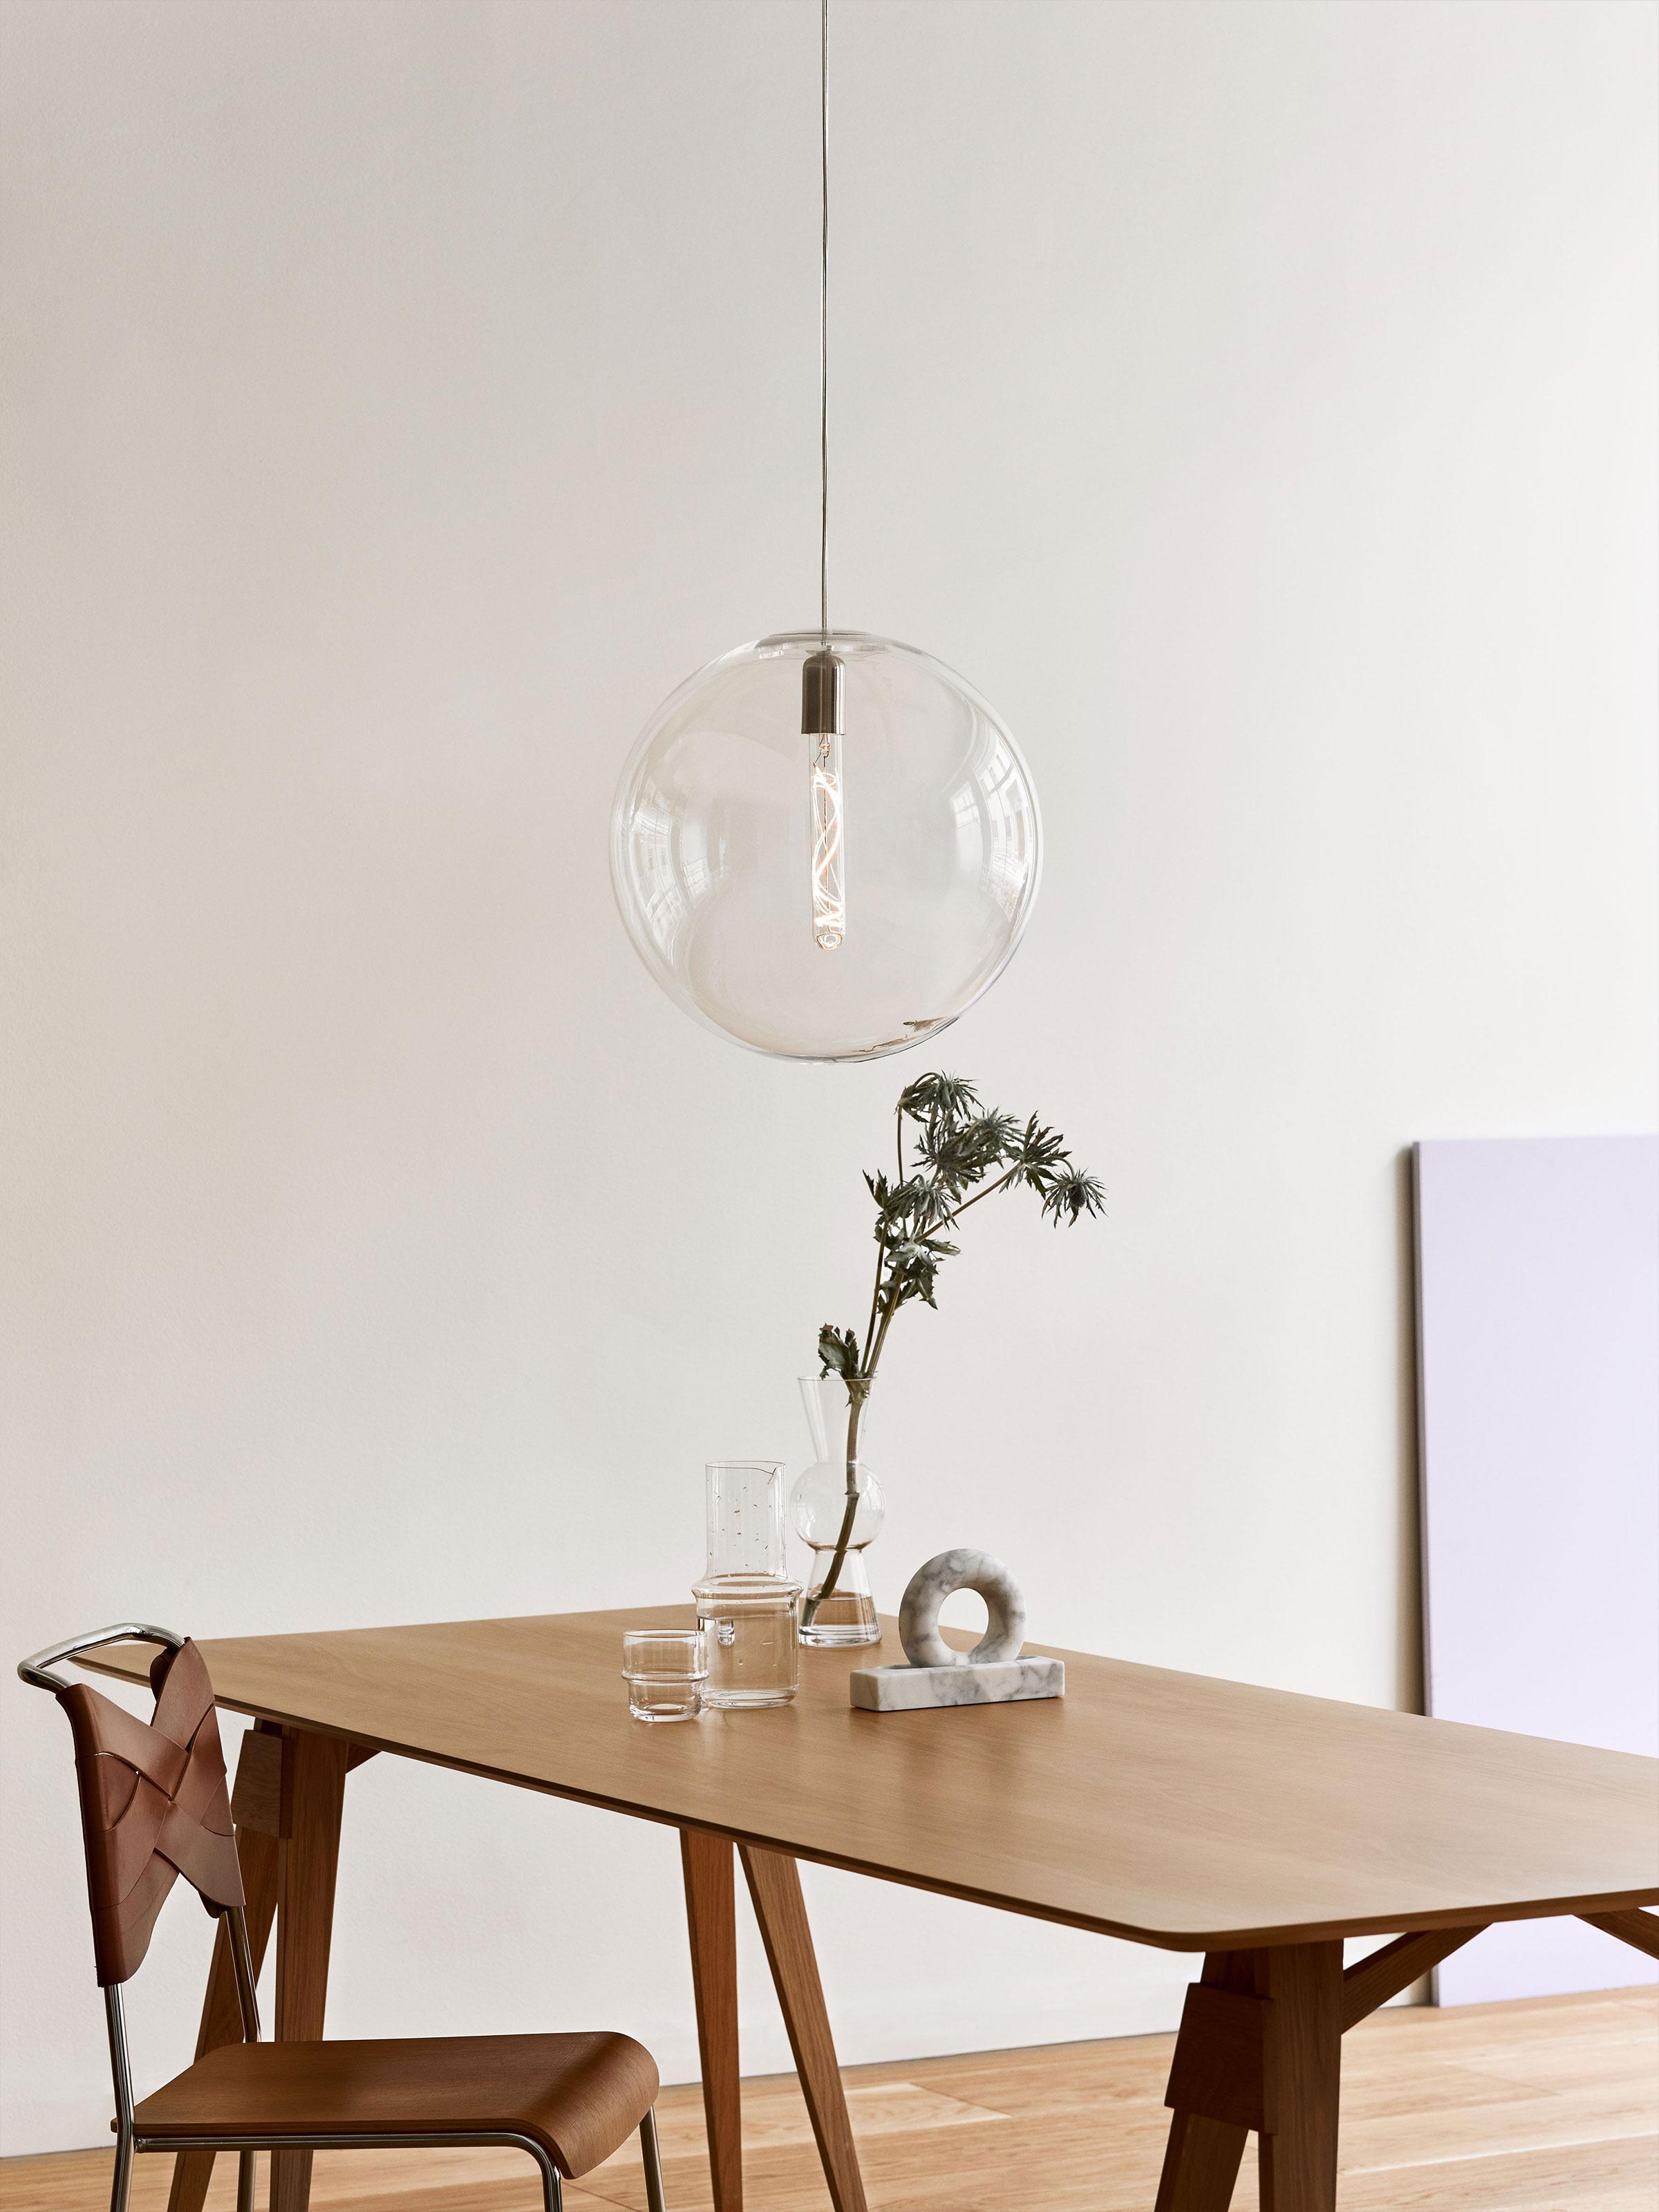 Design House Stockholm — Best New Nordic Furniture and Homewares Brands